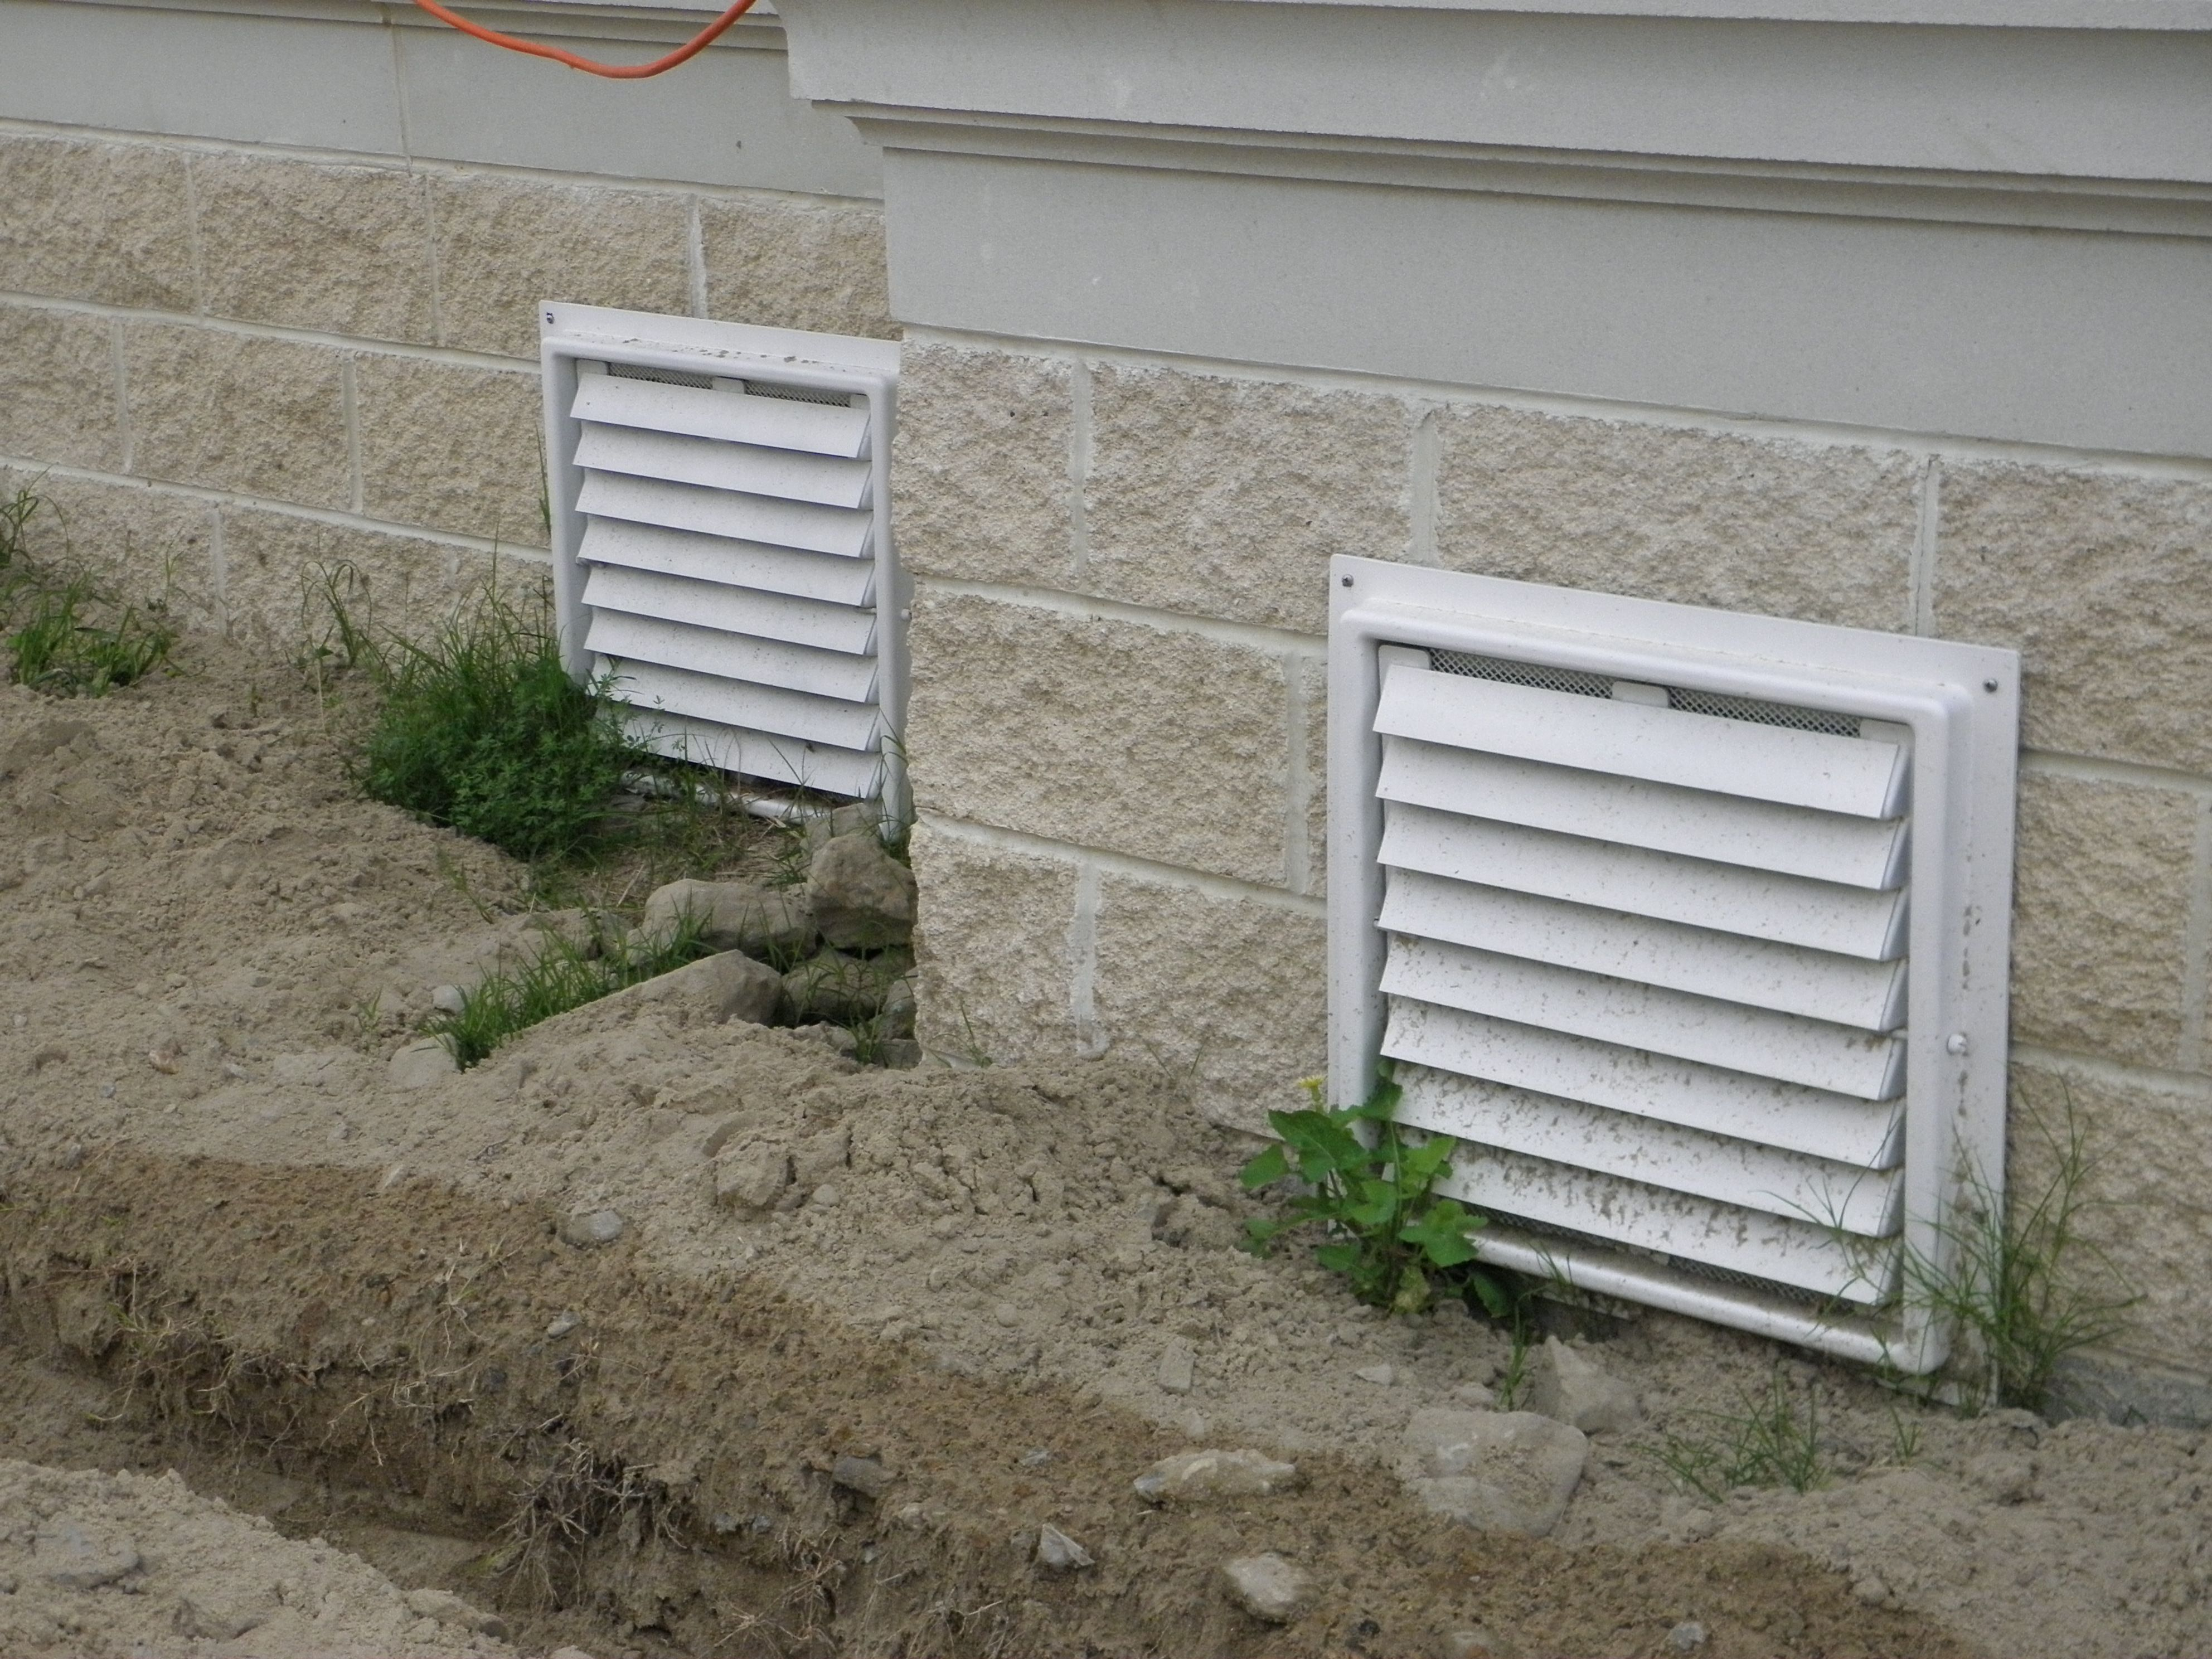 404 Error Flood Vents Flood Insurance Flood Zone